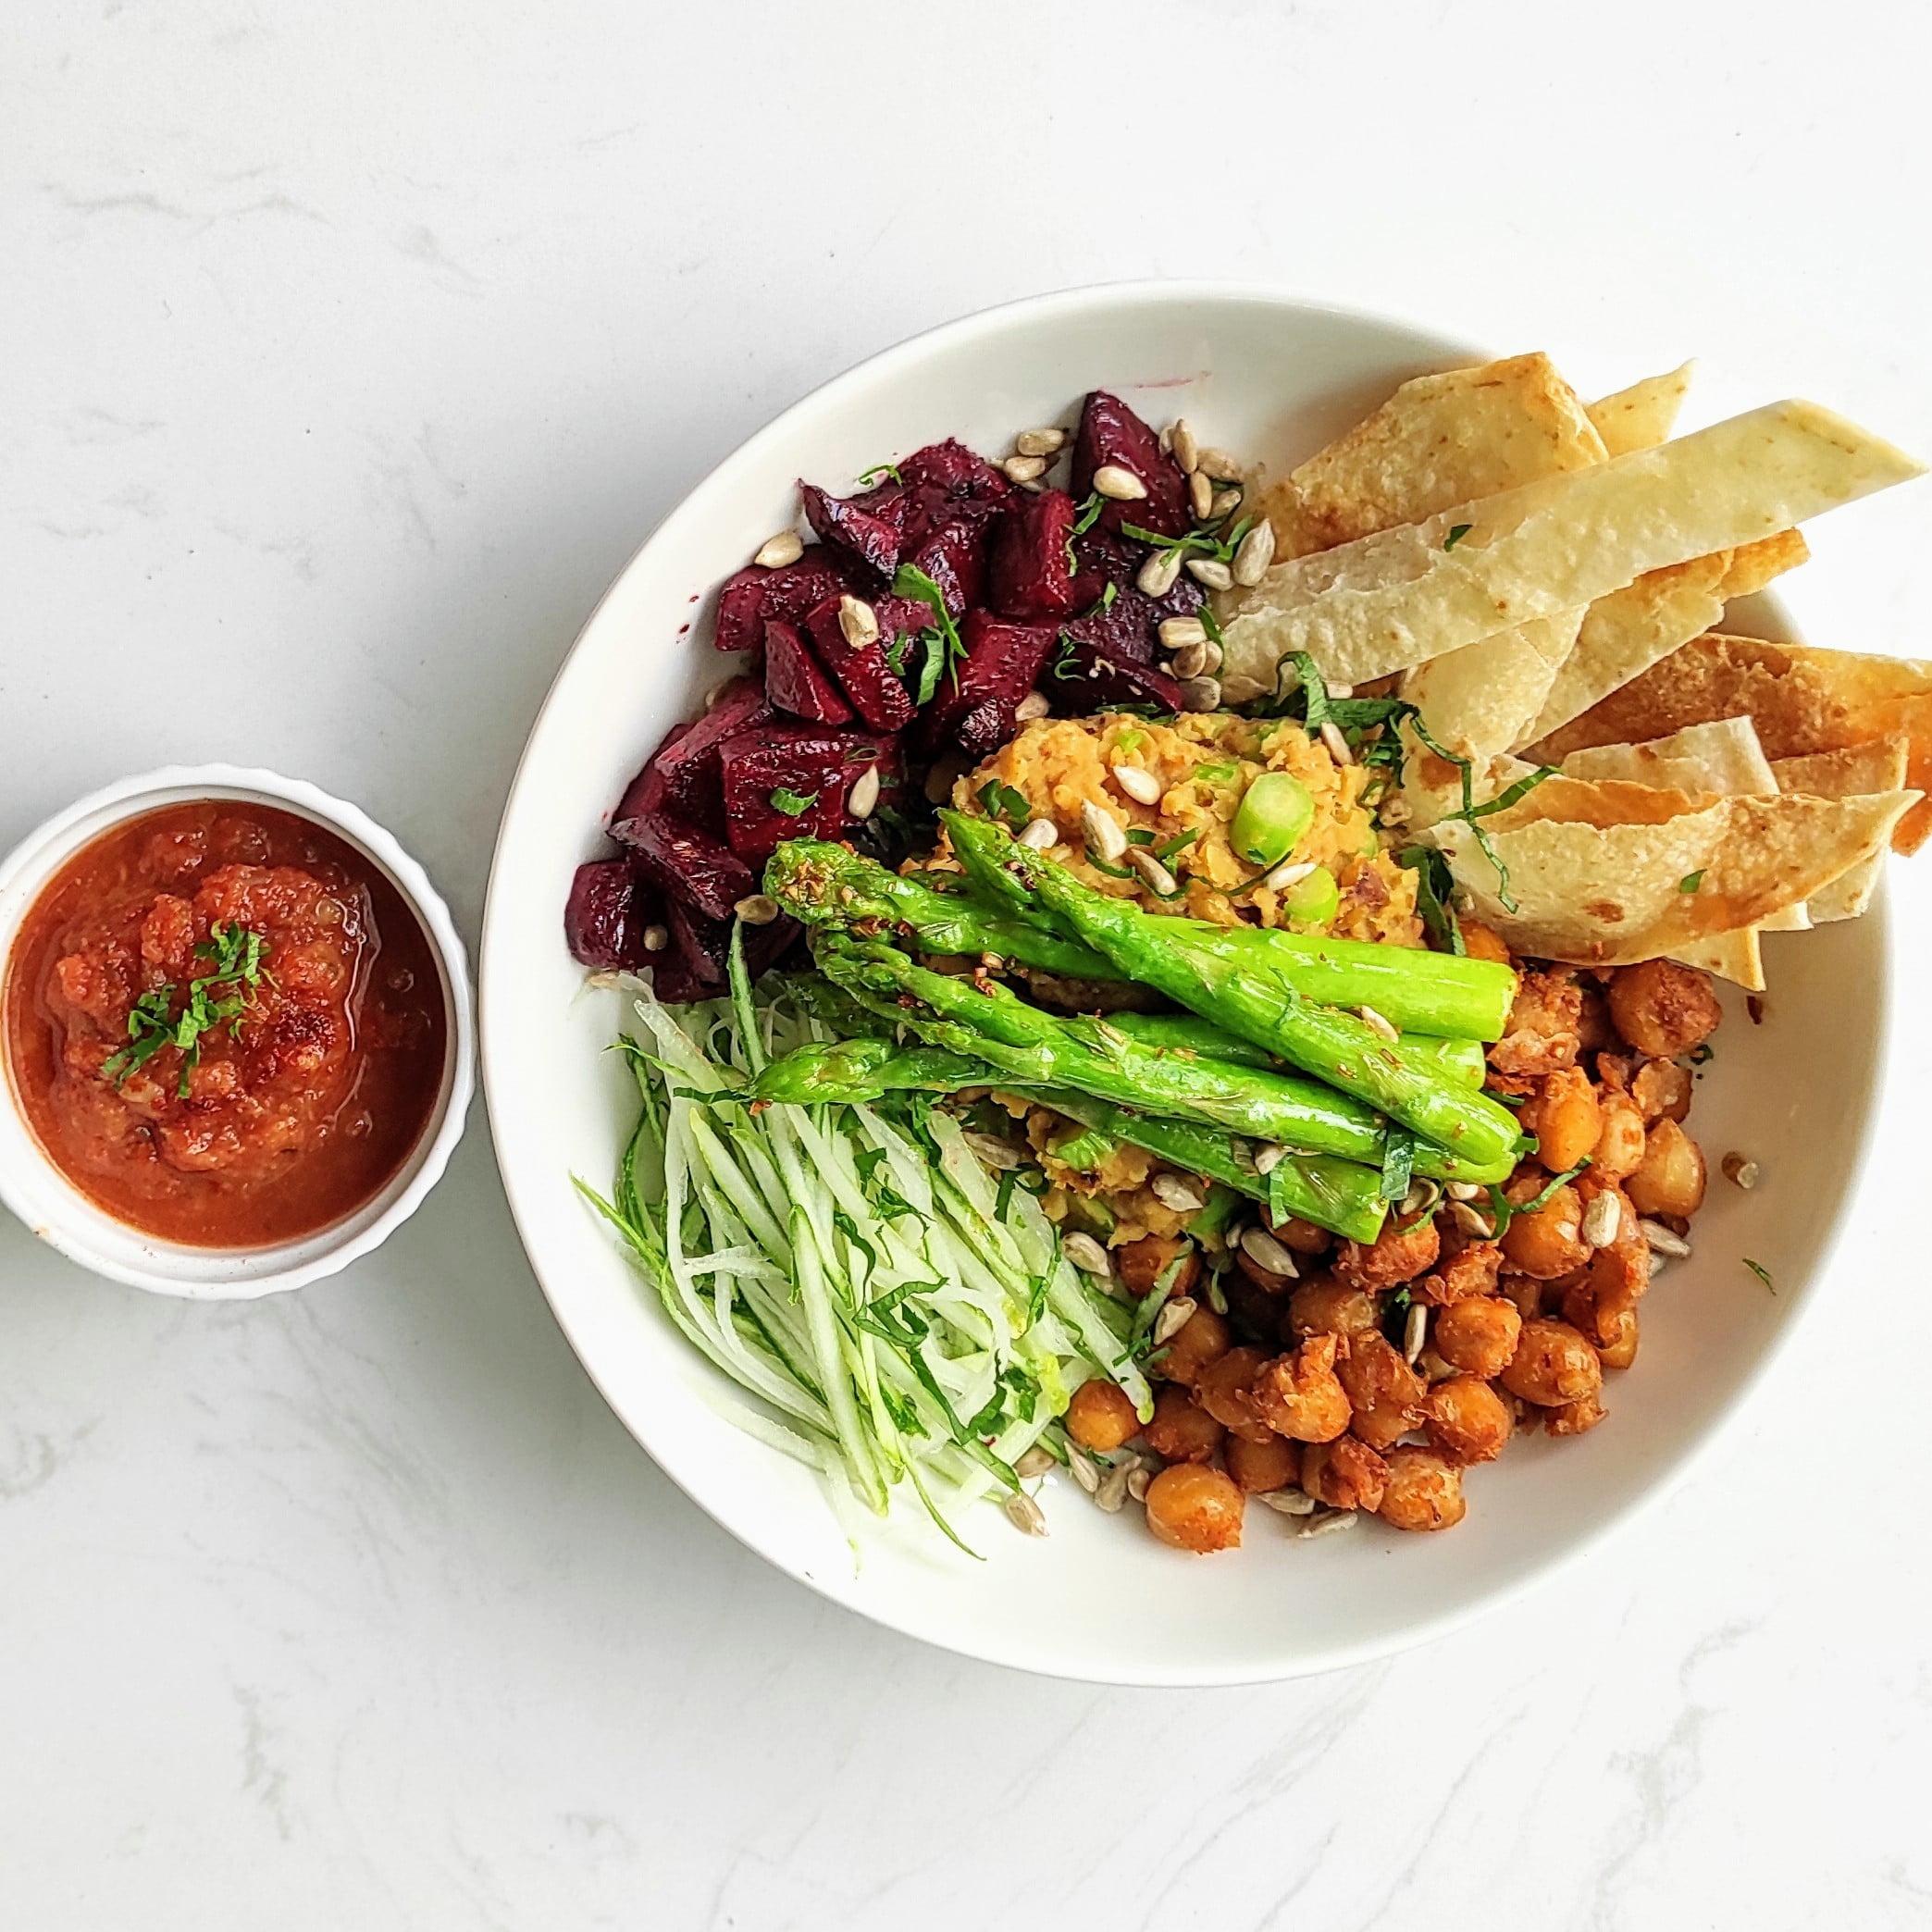 Vegan bowl no.3 V3 beet root